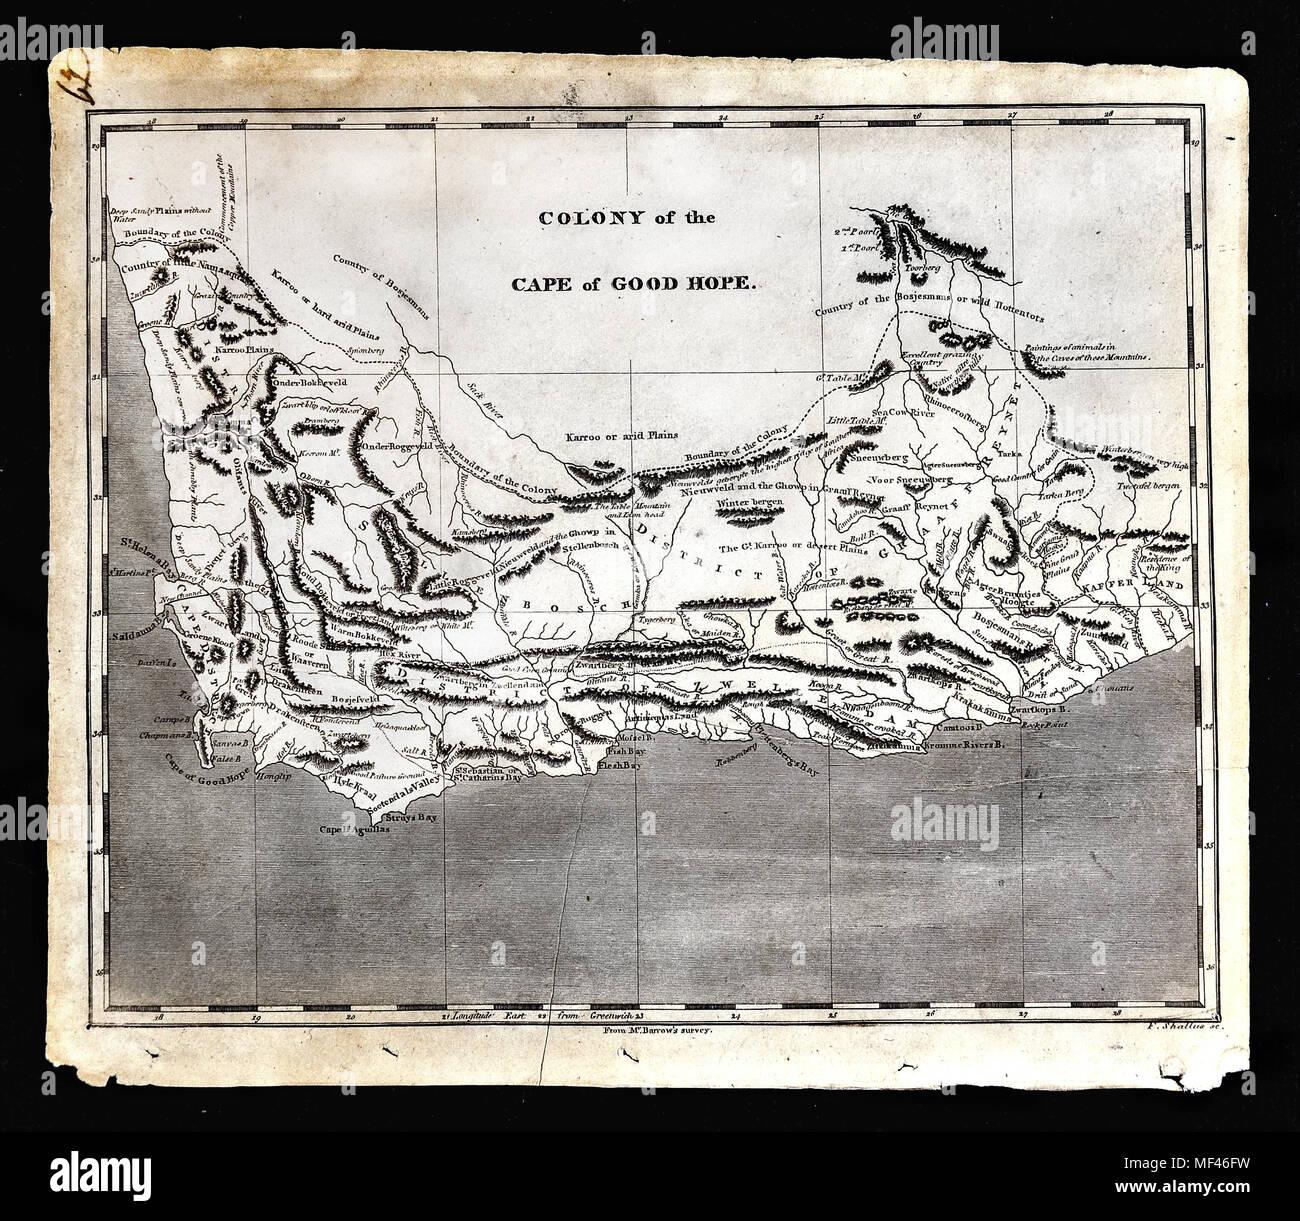 Desierto De Kalahari Mapa.1804 Arrowsmith Mapa Sudafrica Cabo De Buena Esperanza